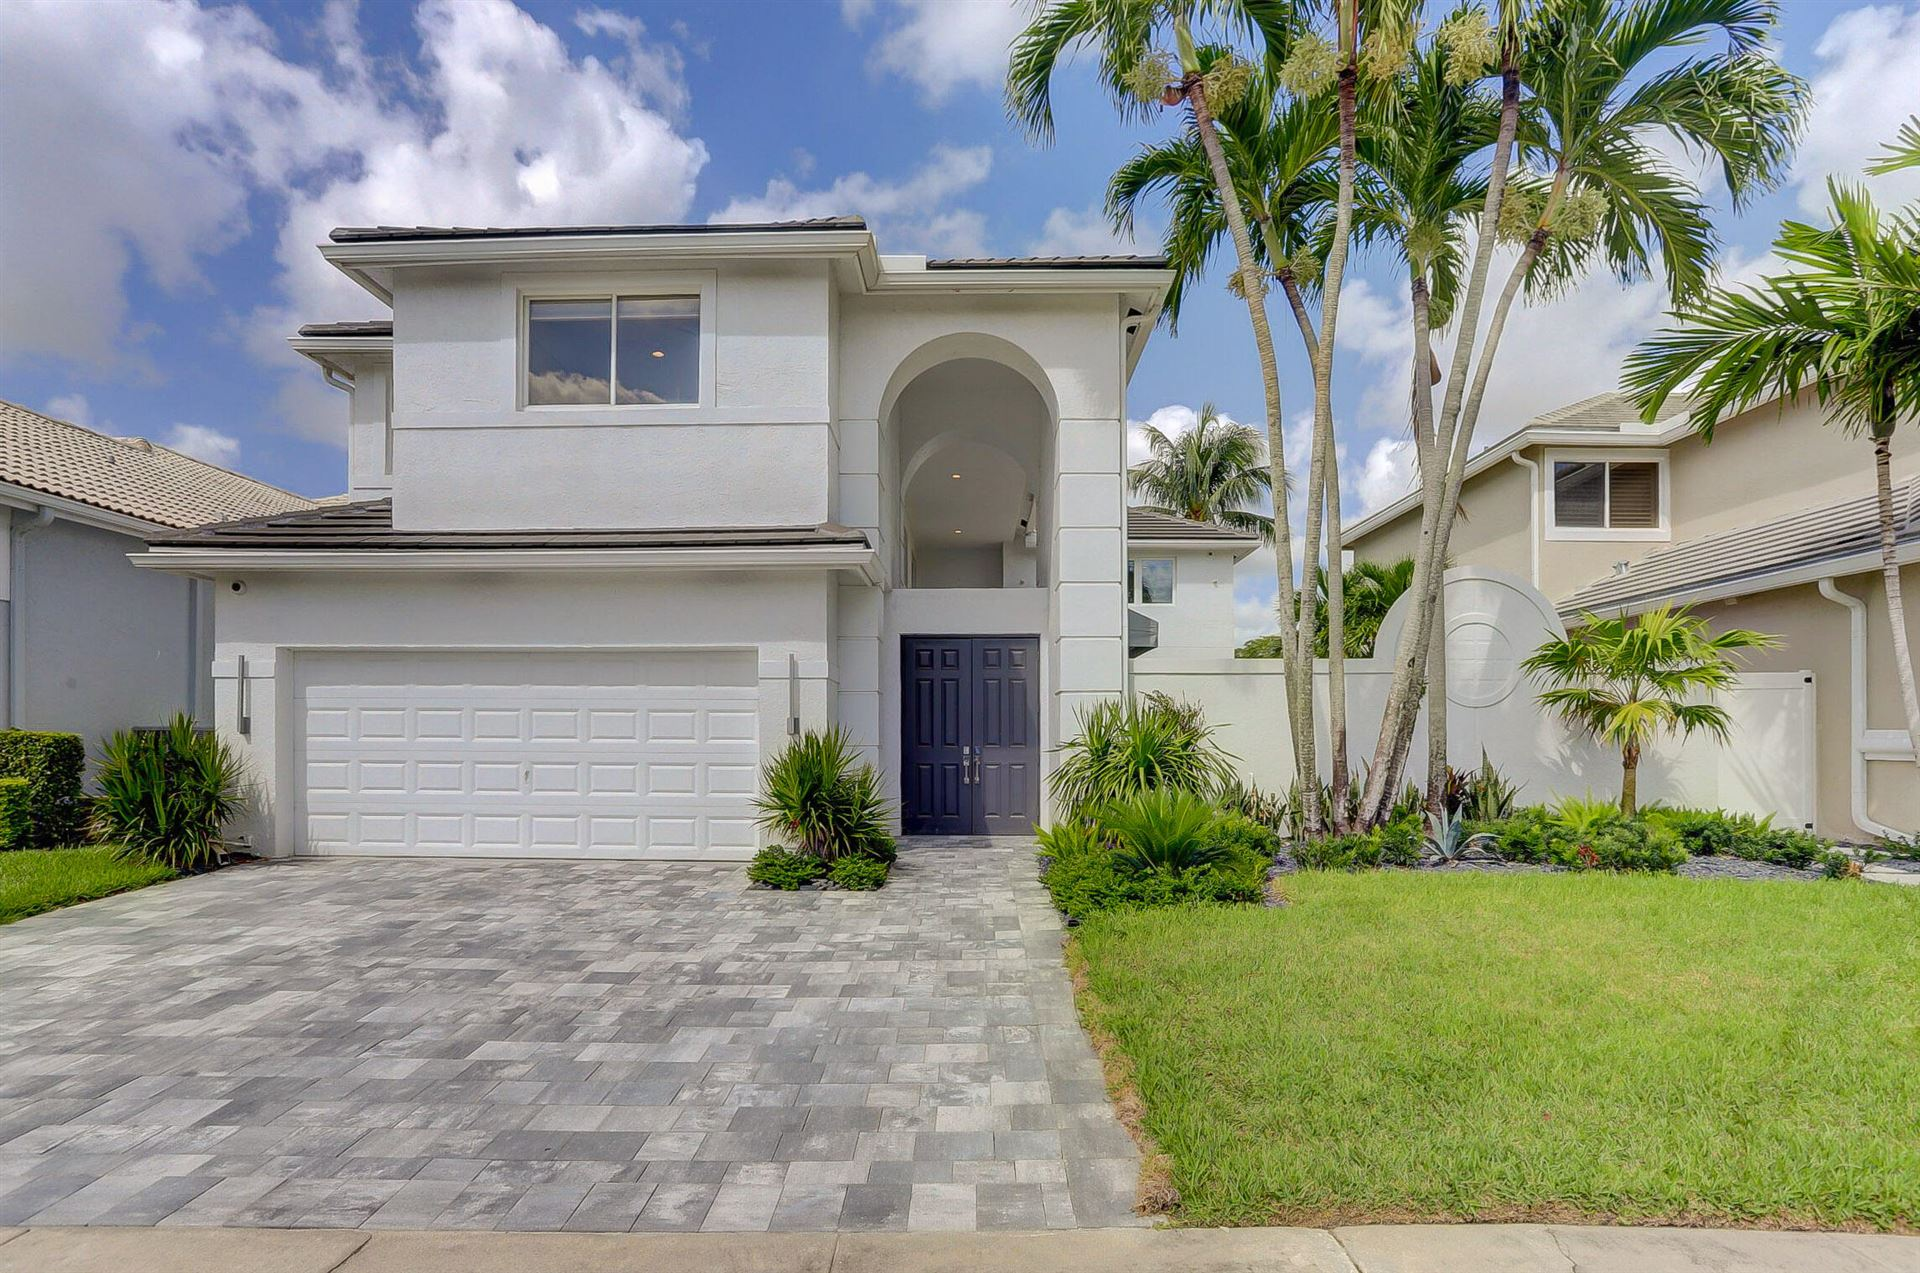 5779 Regency Circle W, Boca Raton, FL 33496 - MLS#: RX-10744469